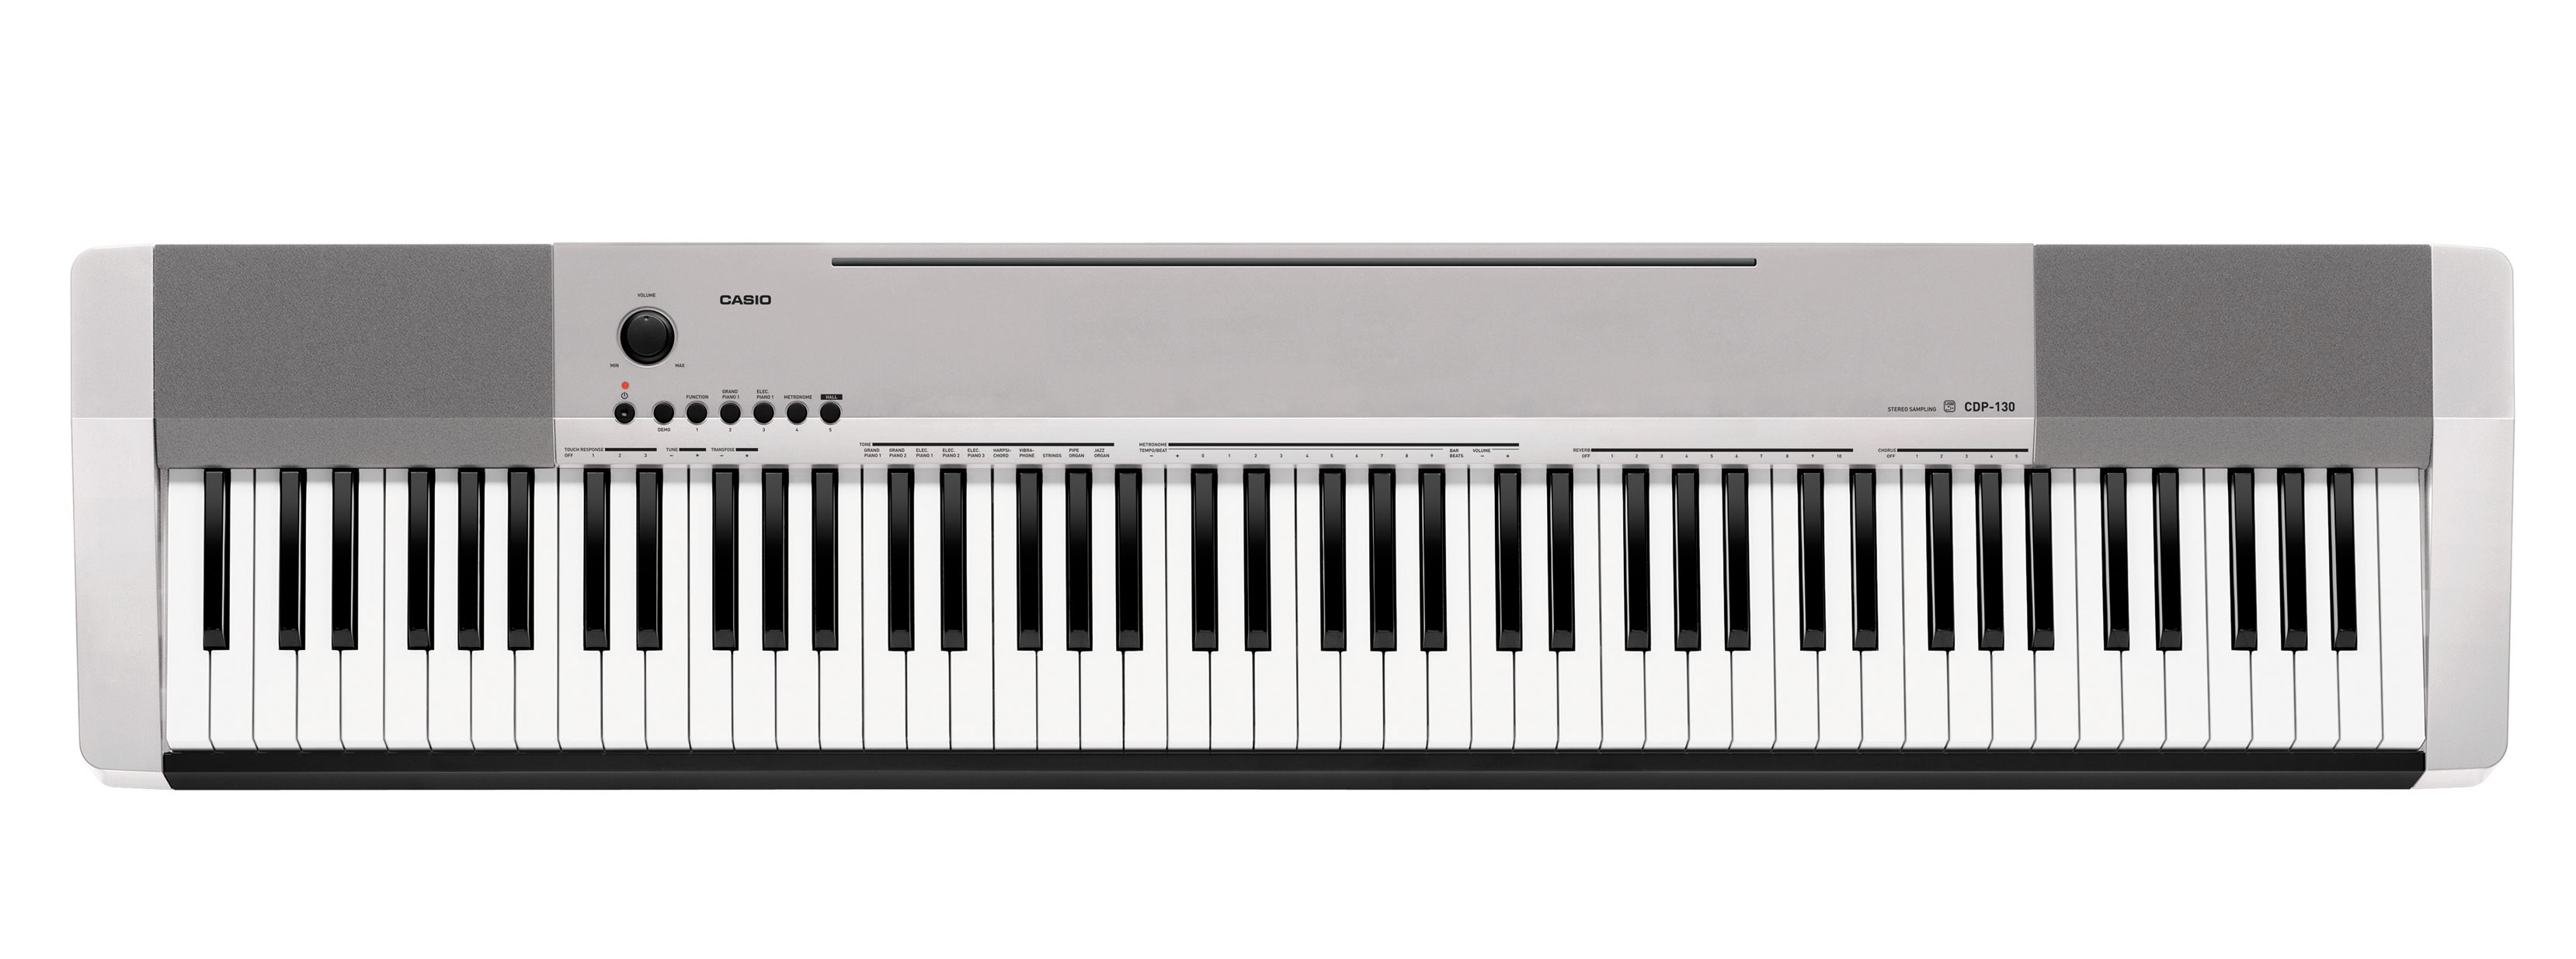 Цифровое пианино Casio CDP-130SR: фото